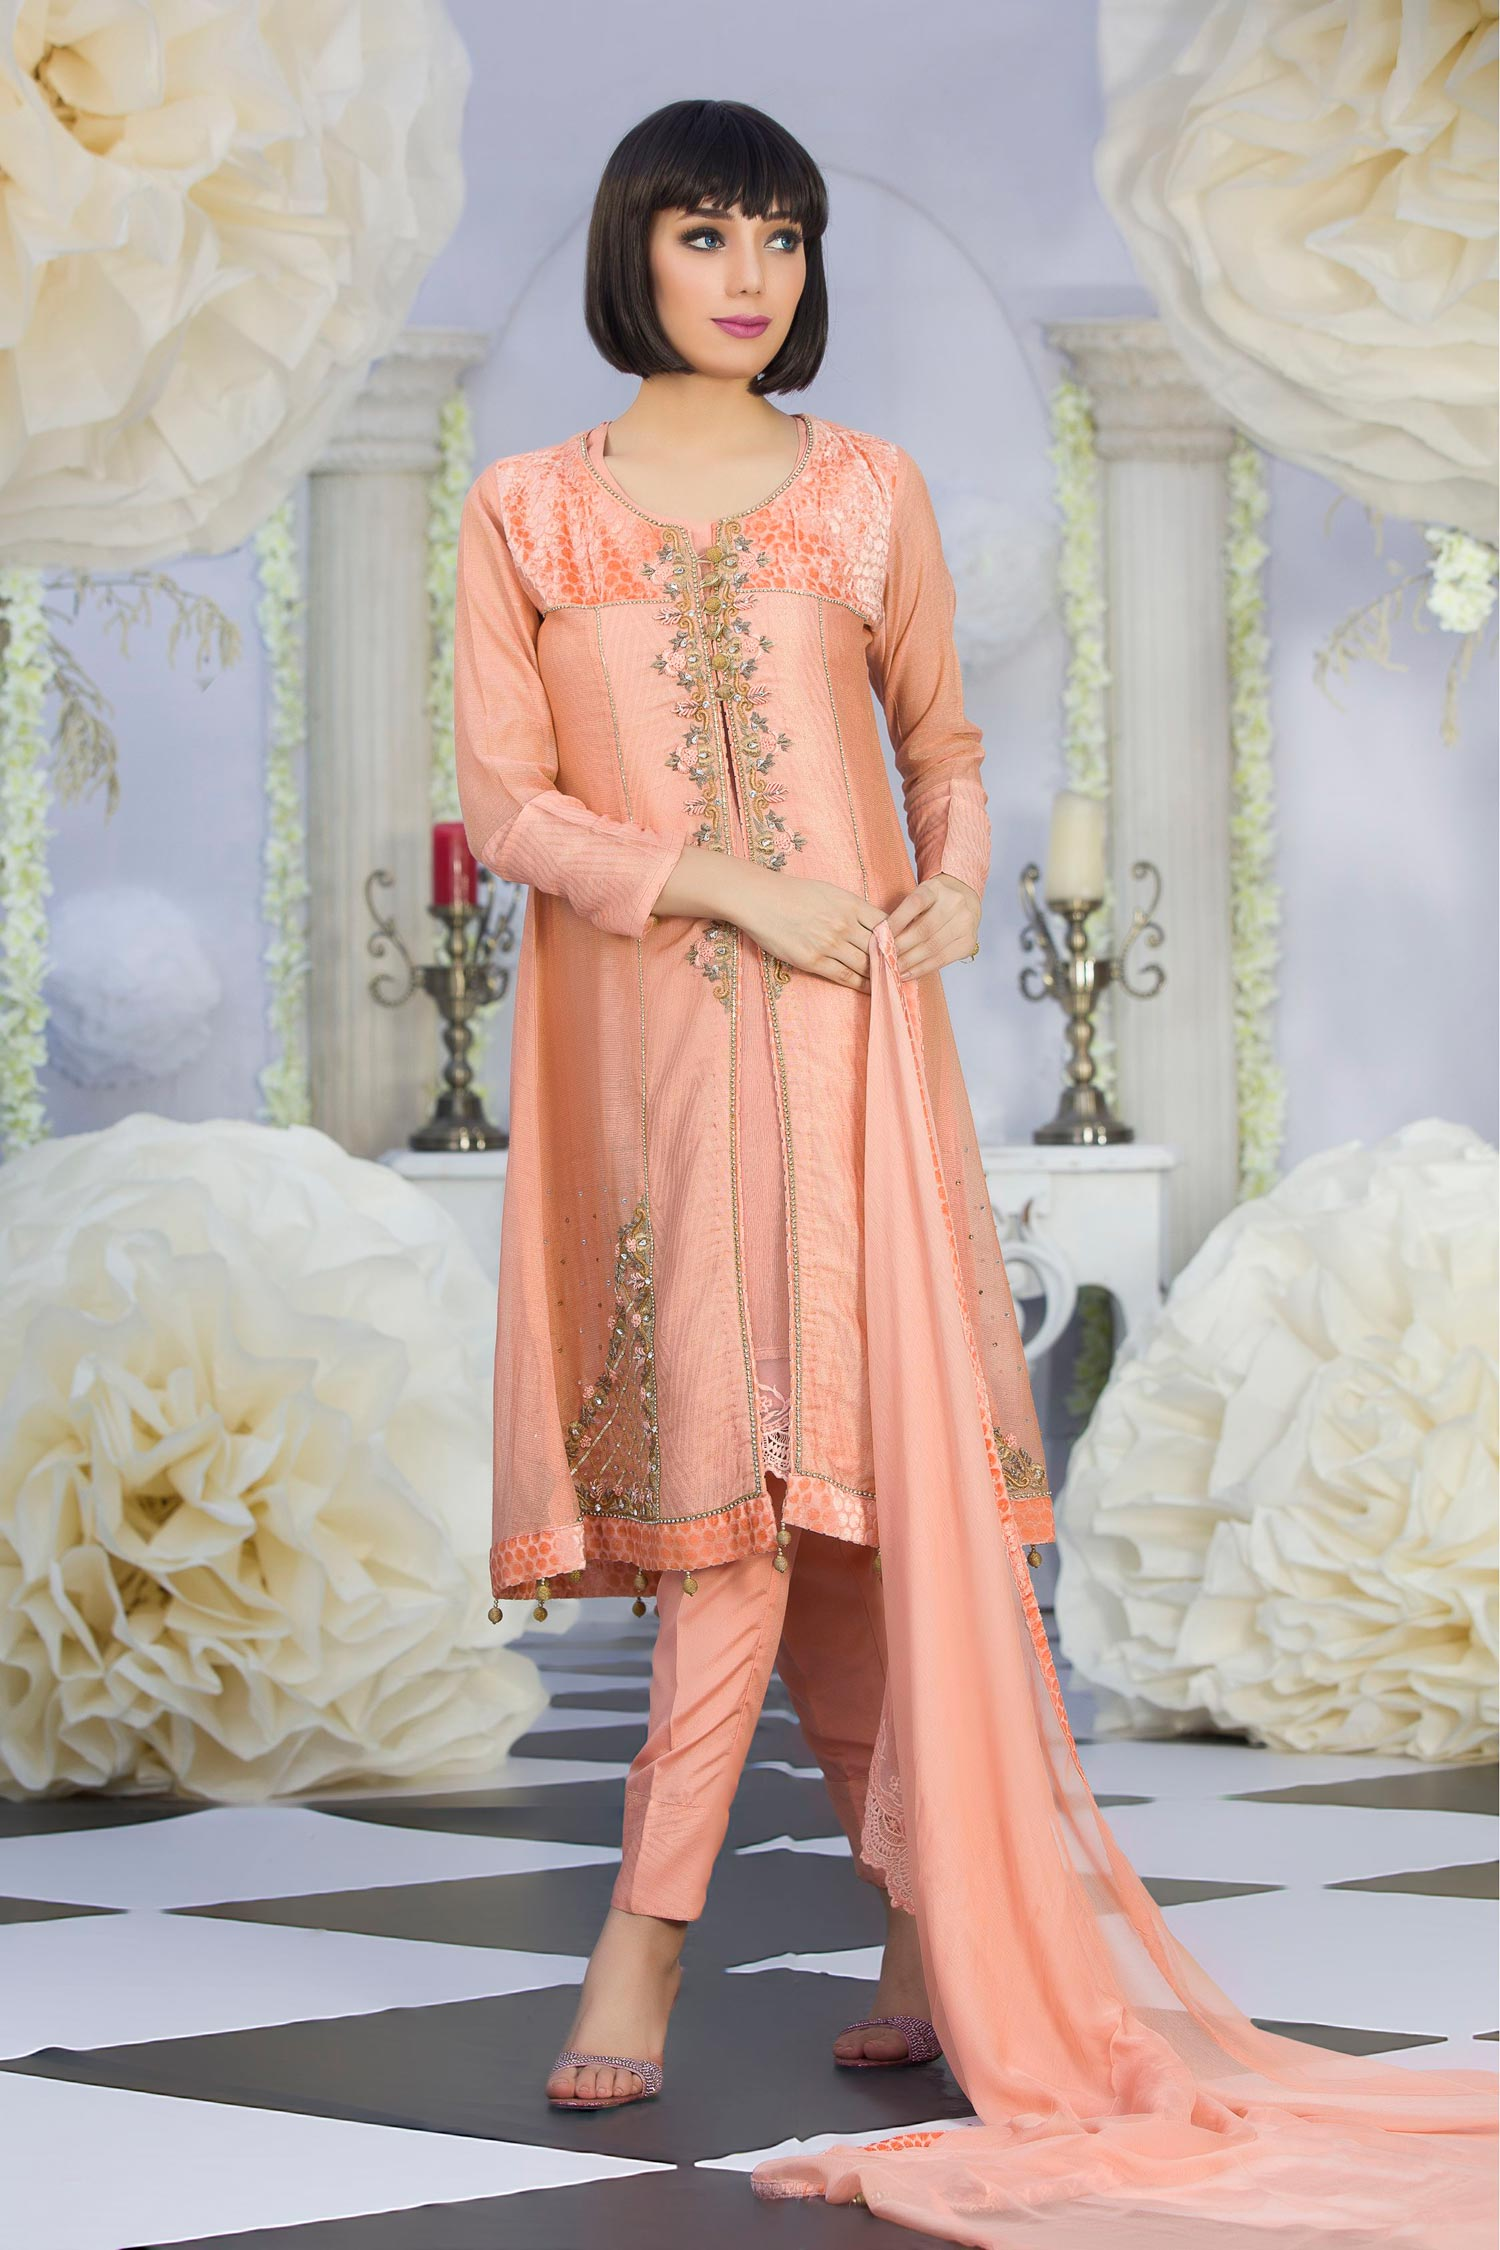 2ac068eeb7a Exclusive Latest Peach Color Party Dress - Exclusive Online Boutique